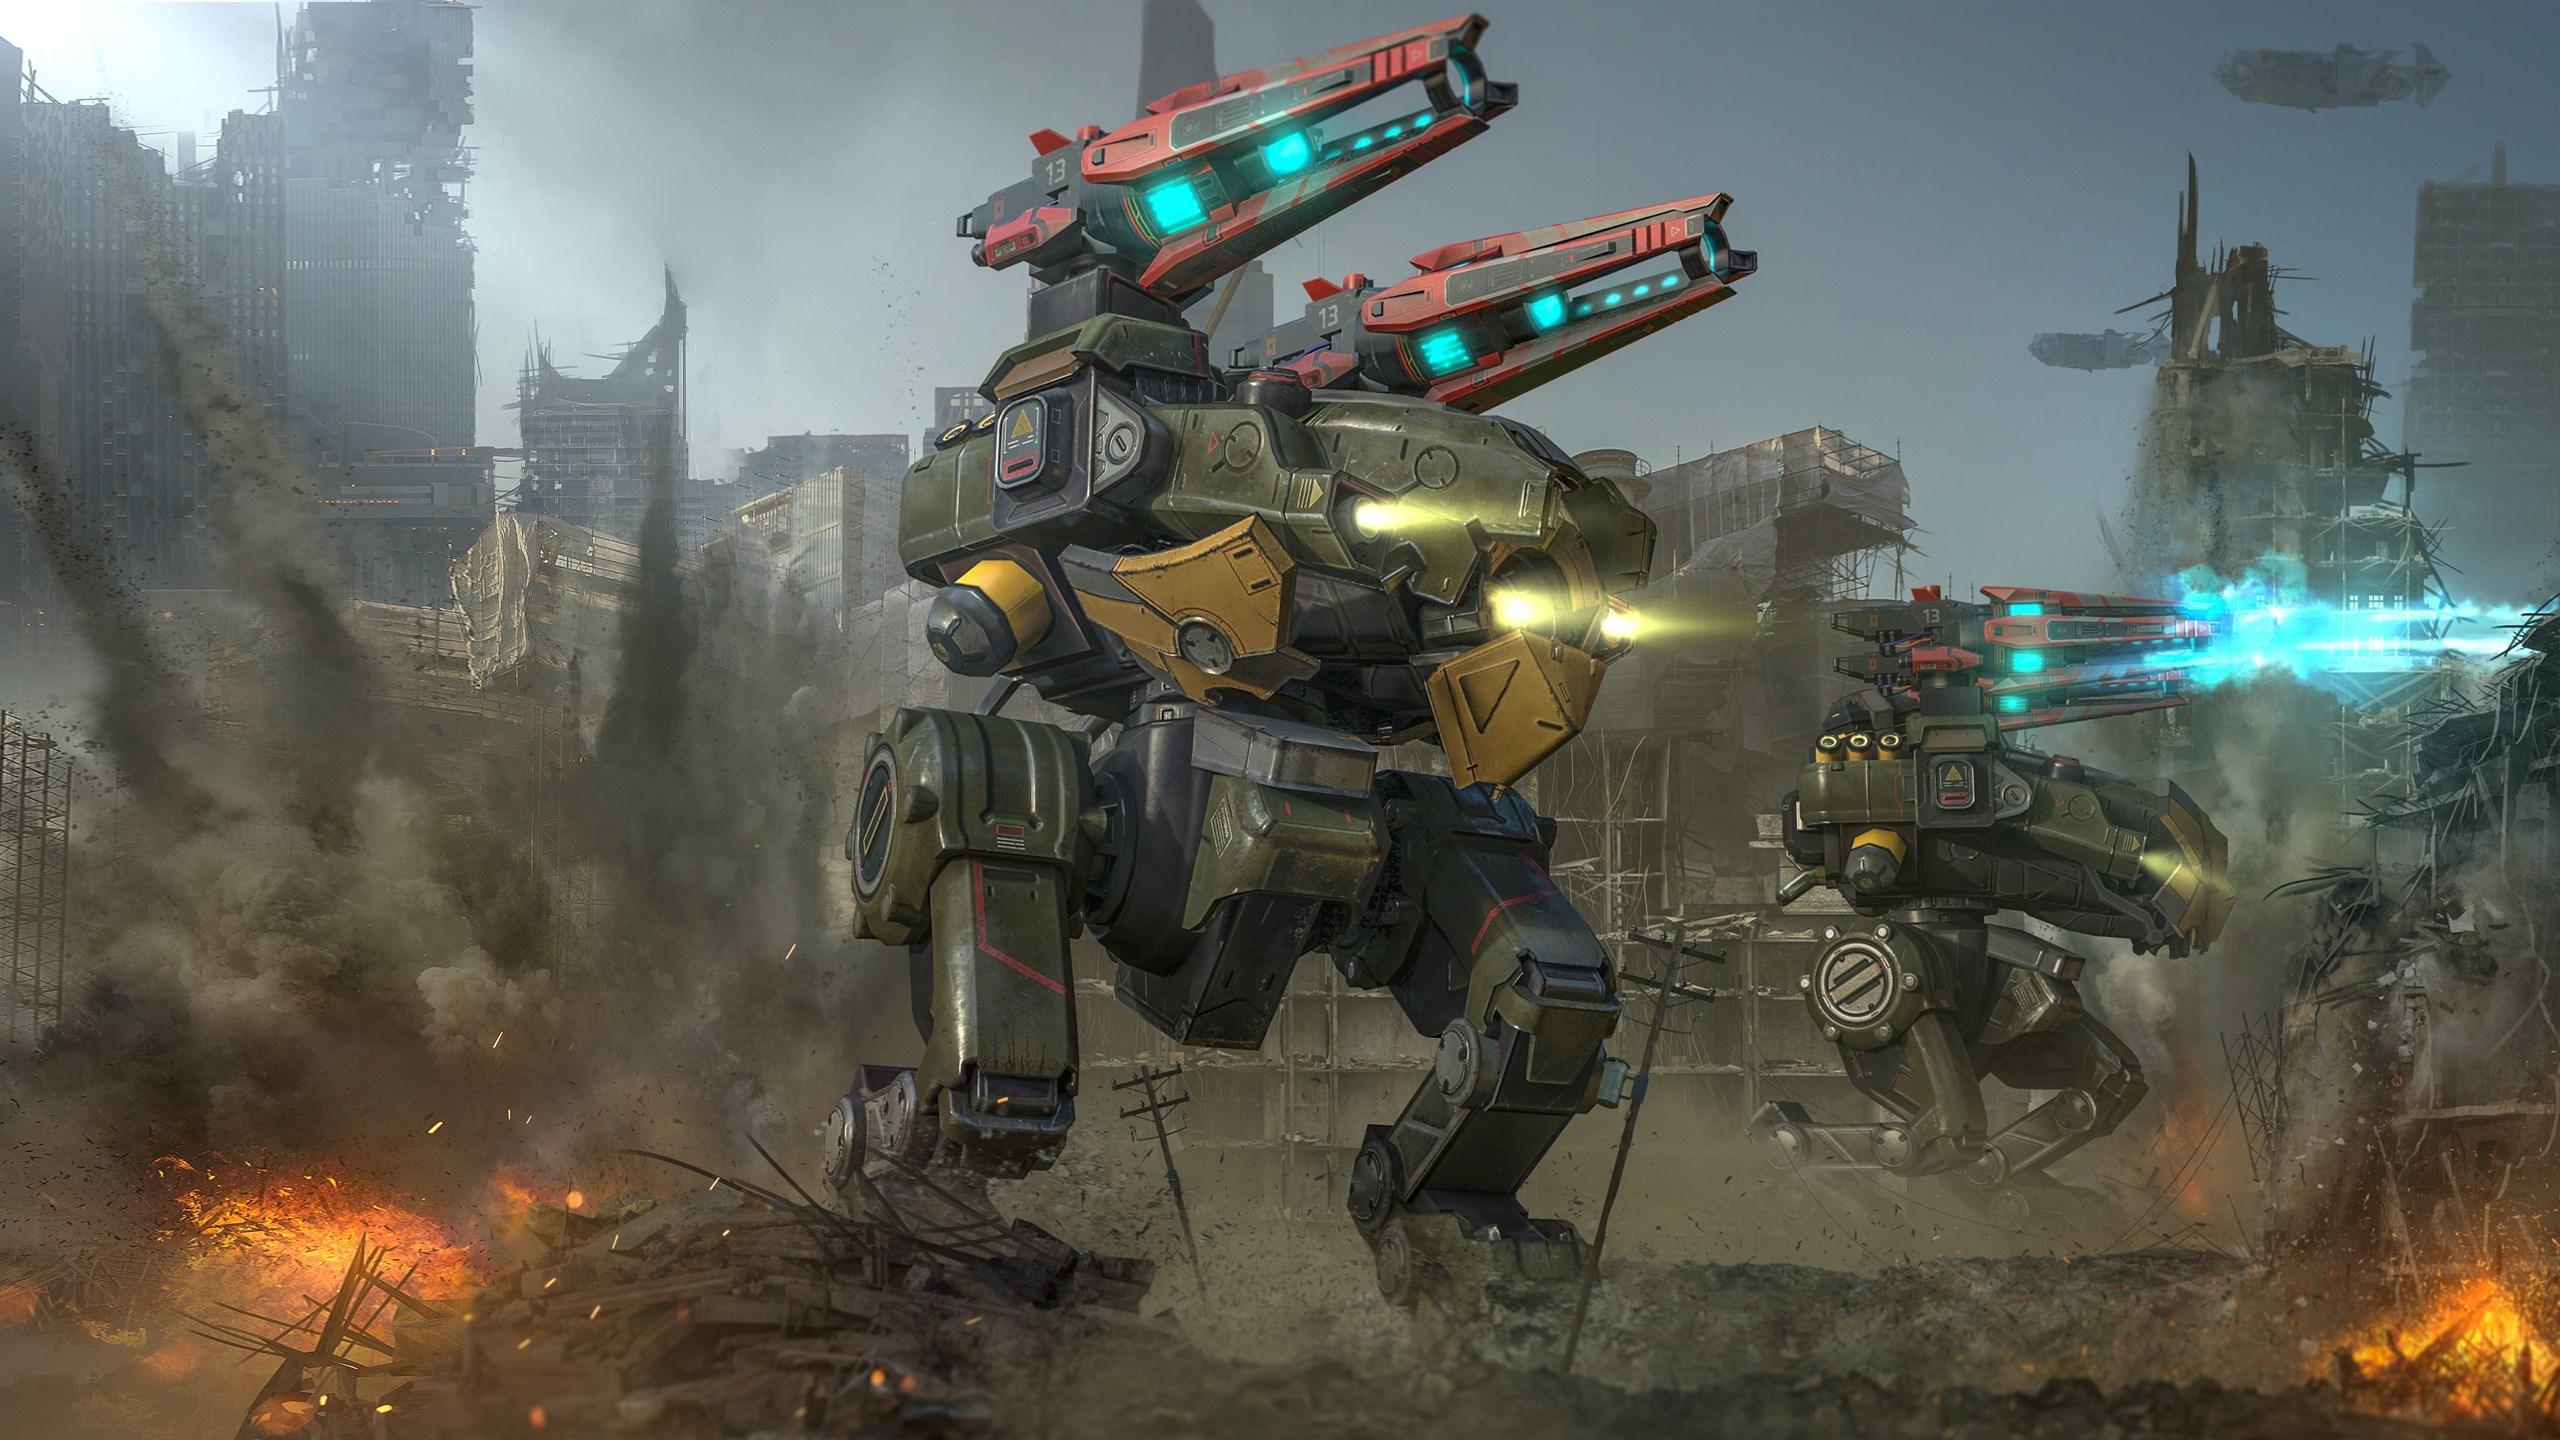 Walking war robots robots matchmaking tiers